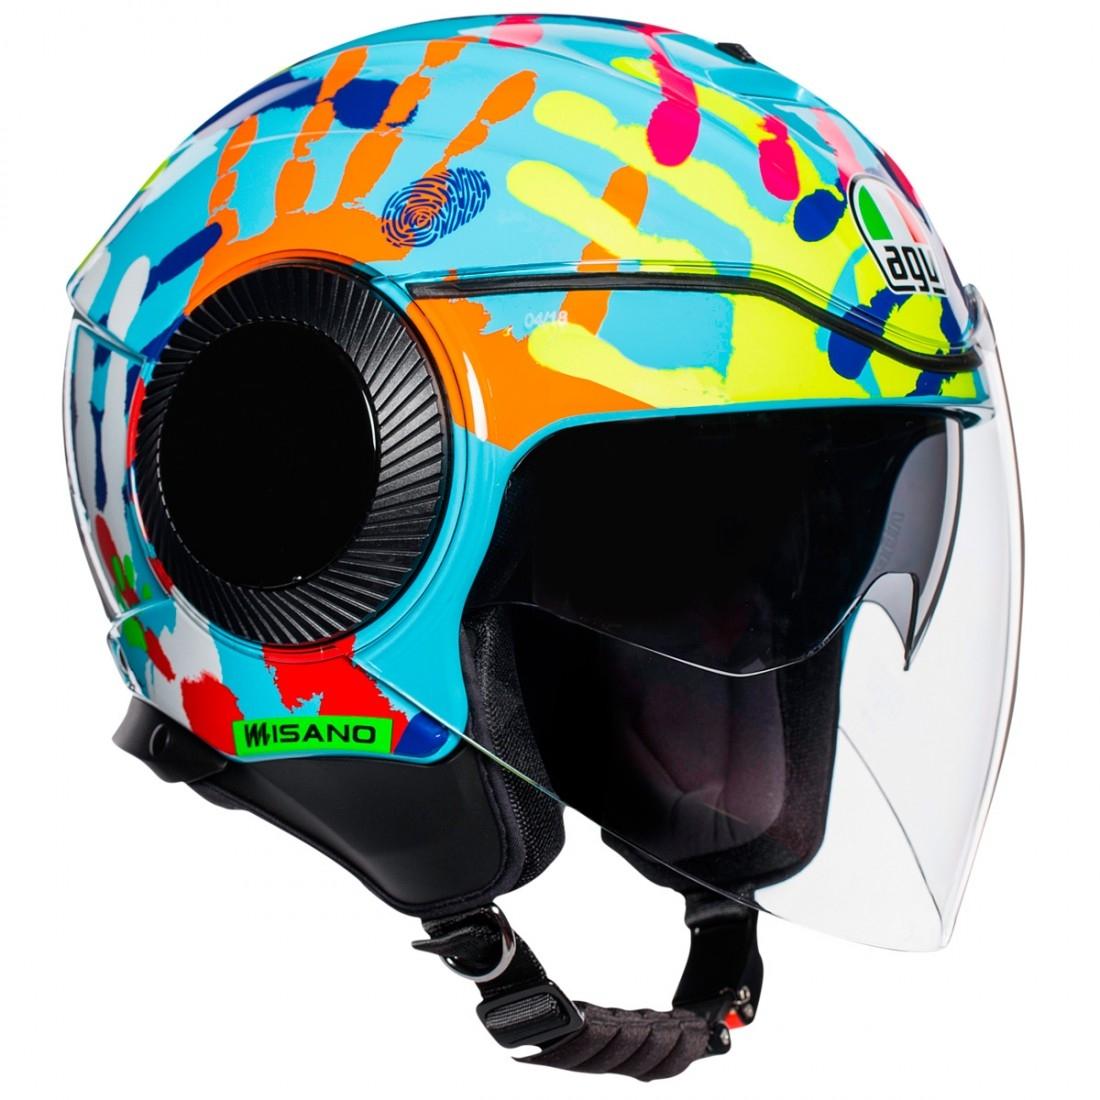 agv orbyt rossi misano 2014 helmet motocard